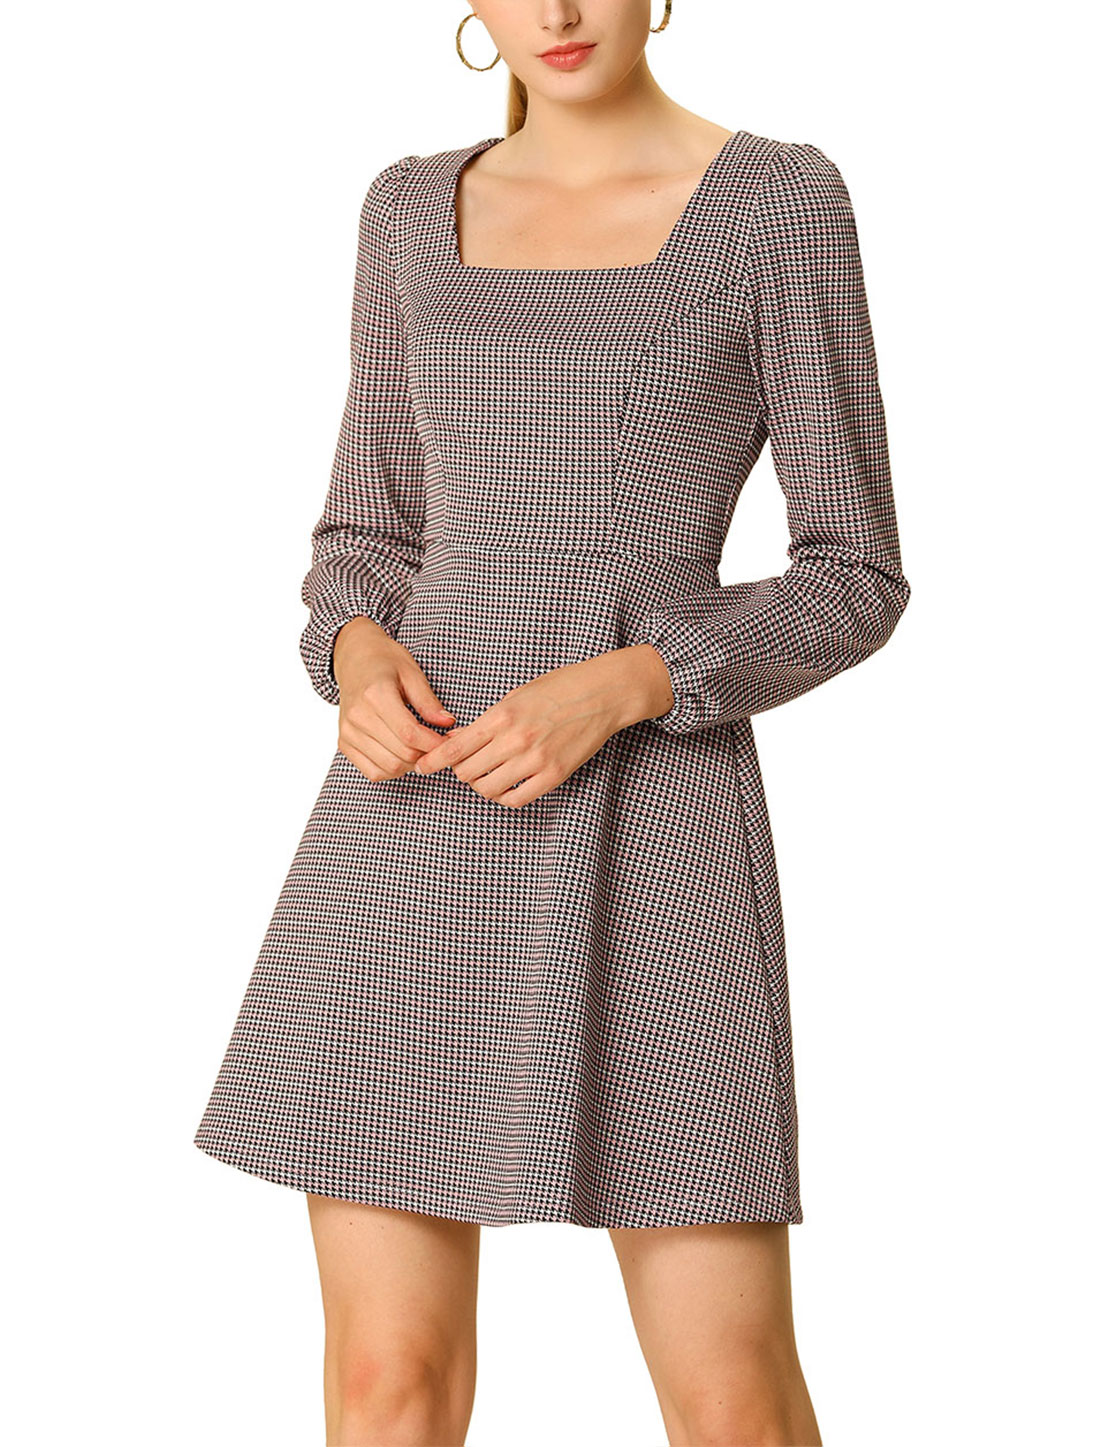 Allegra K Women's Fall Square Neck Vintage Mini Plaid Dress Pink XL